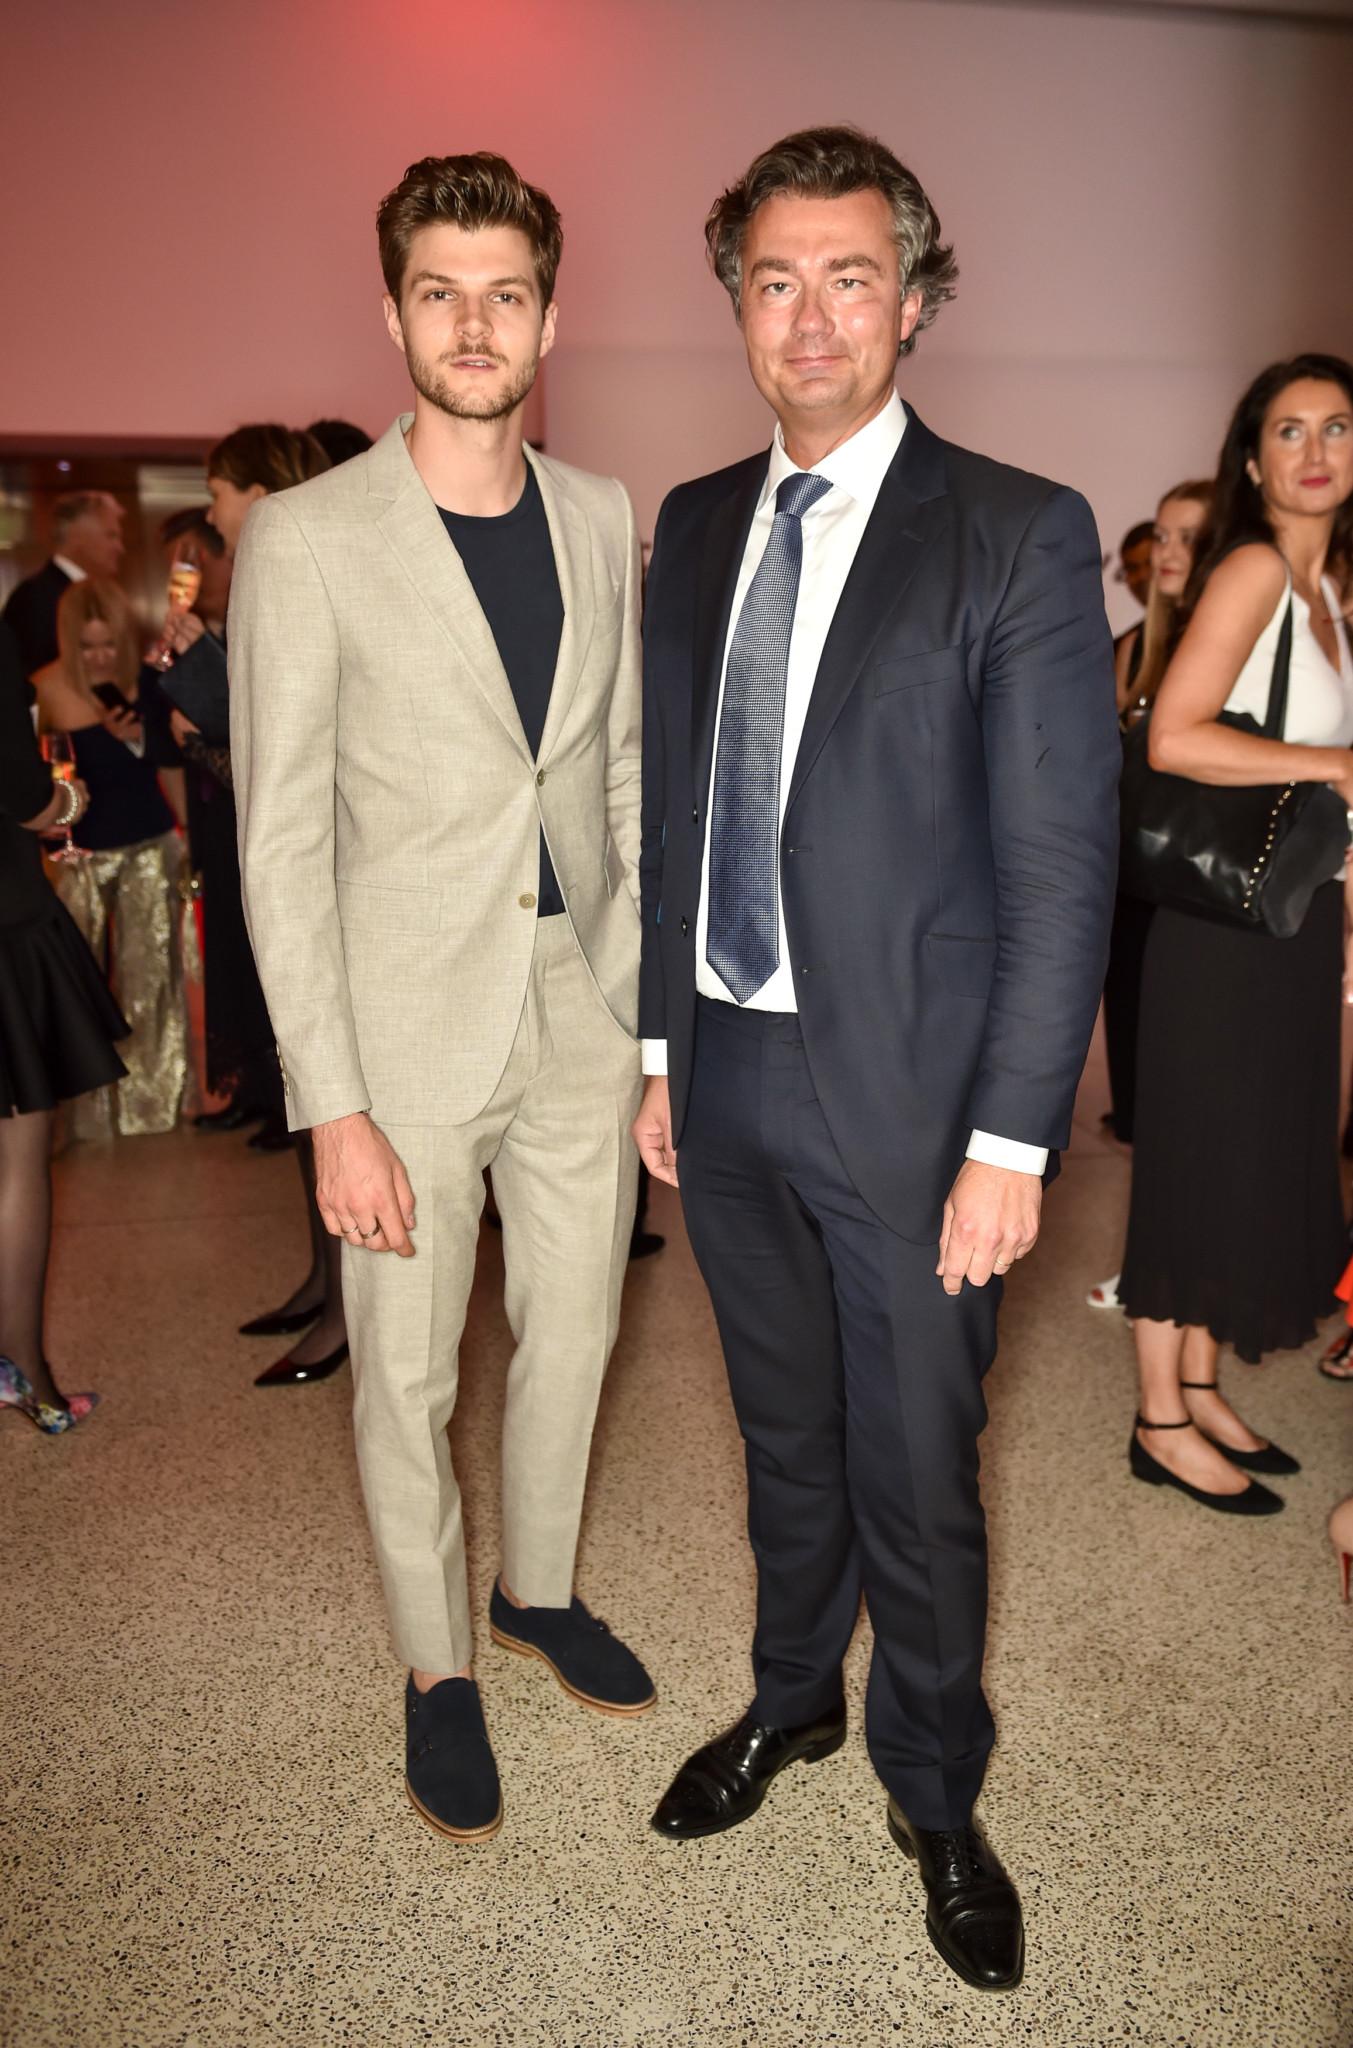 Jim Chapman and Laurent Feniou